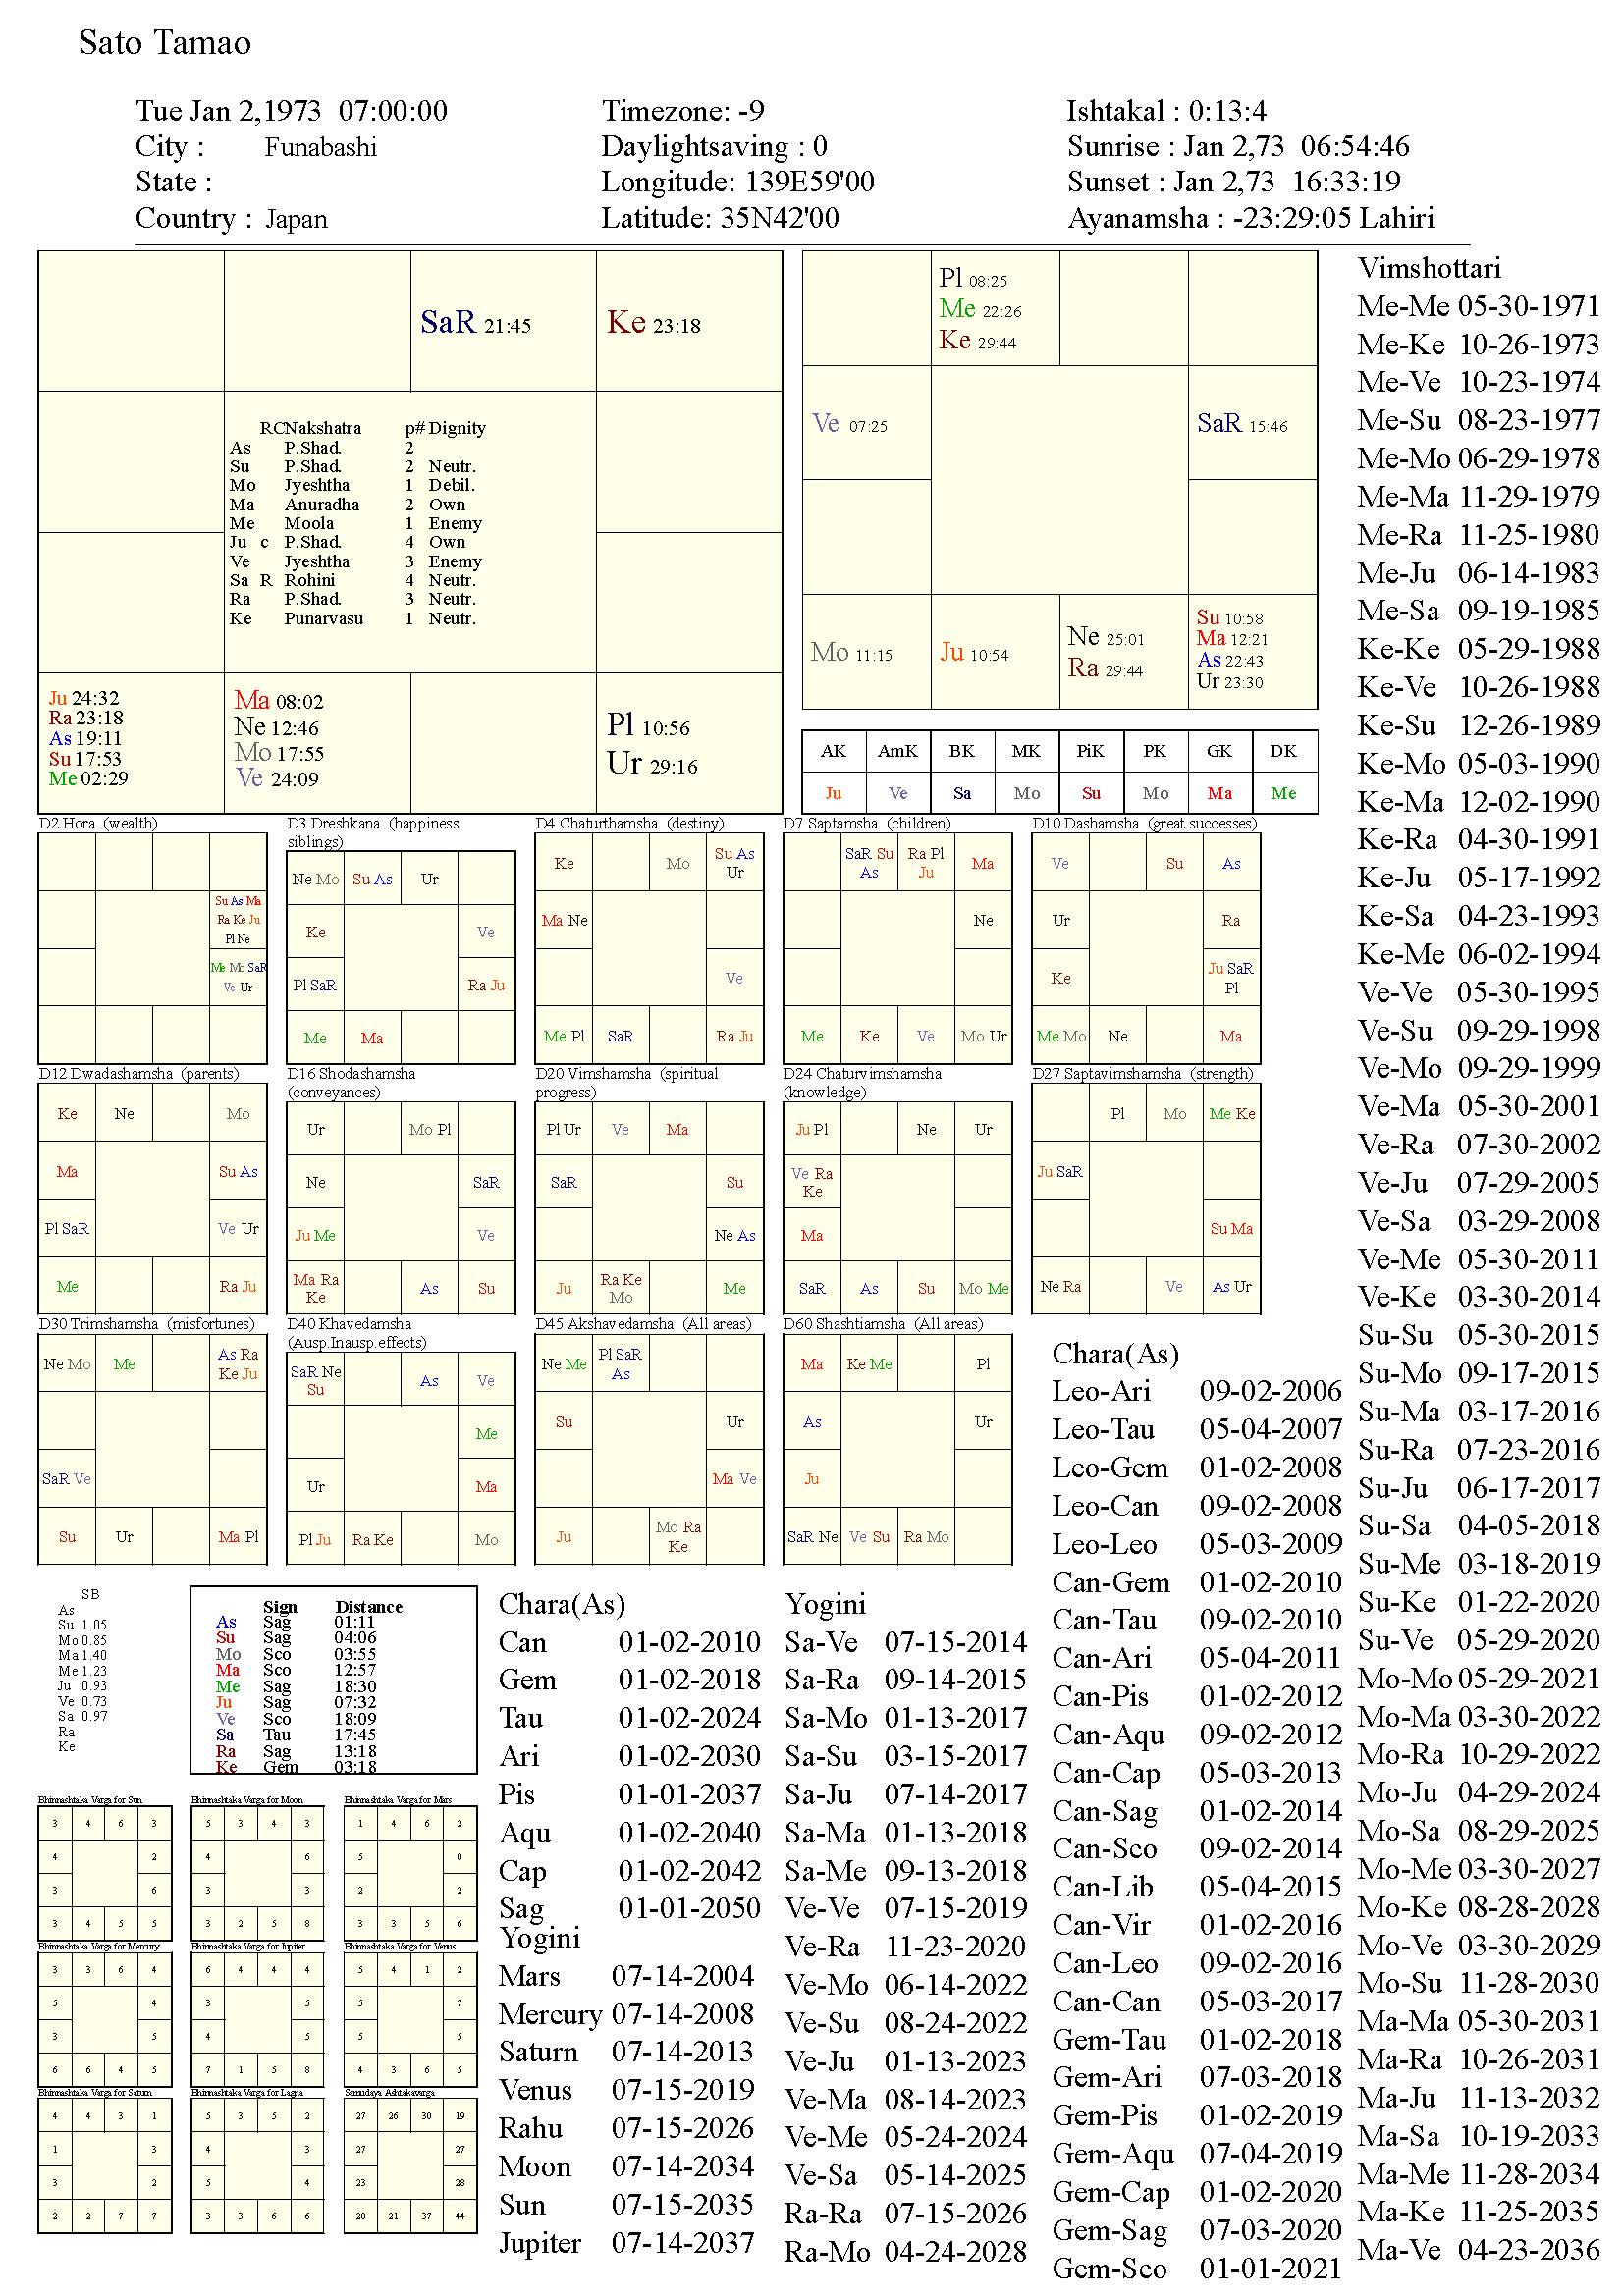 satotamao_chart